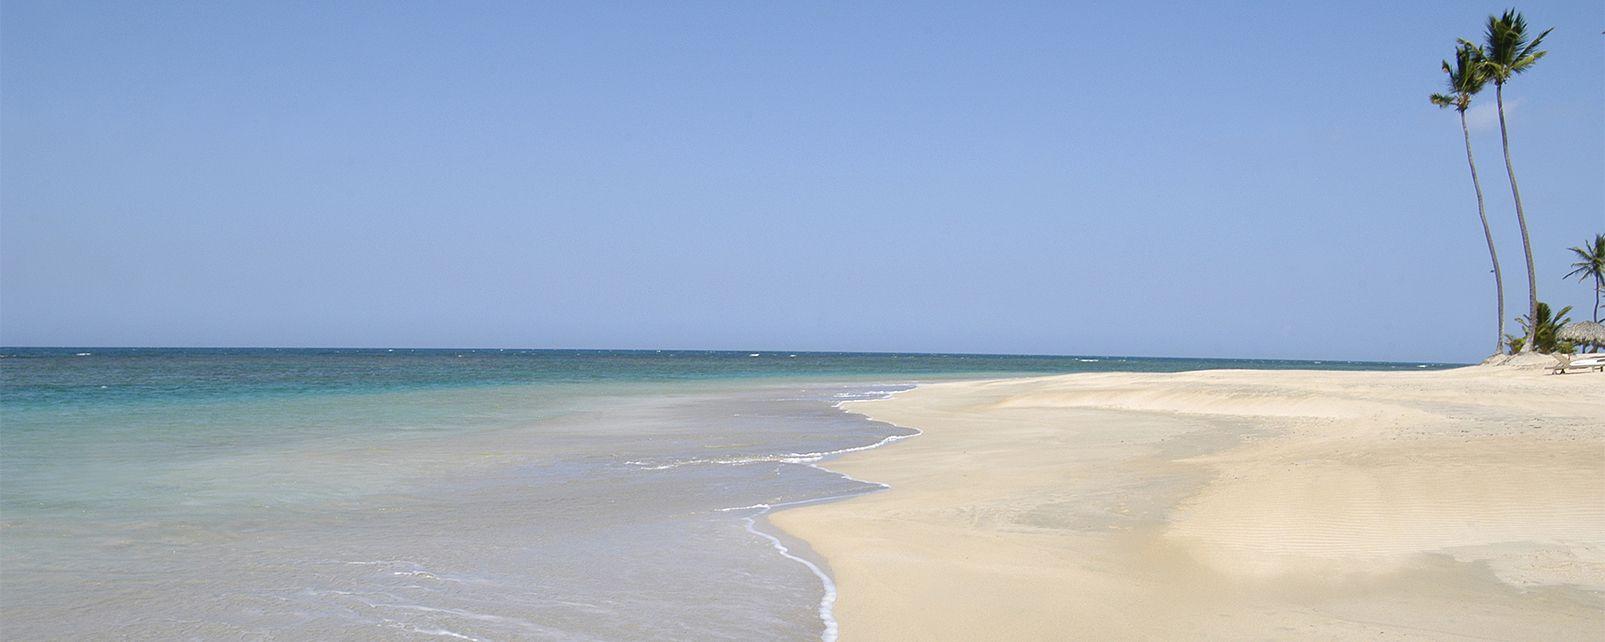 Playa Bavaro a Punta Cana, Playa Bavaro à Punta Cana, Le isole e le spiagge, Punta Cana, Repubblica Dominicana